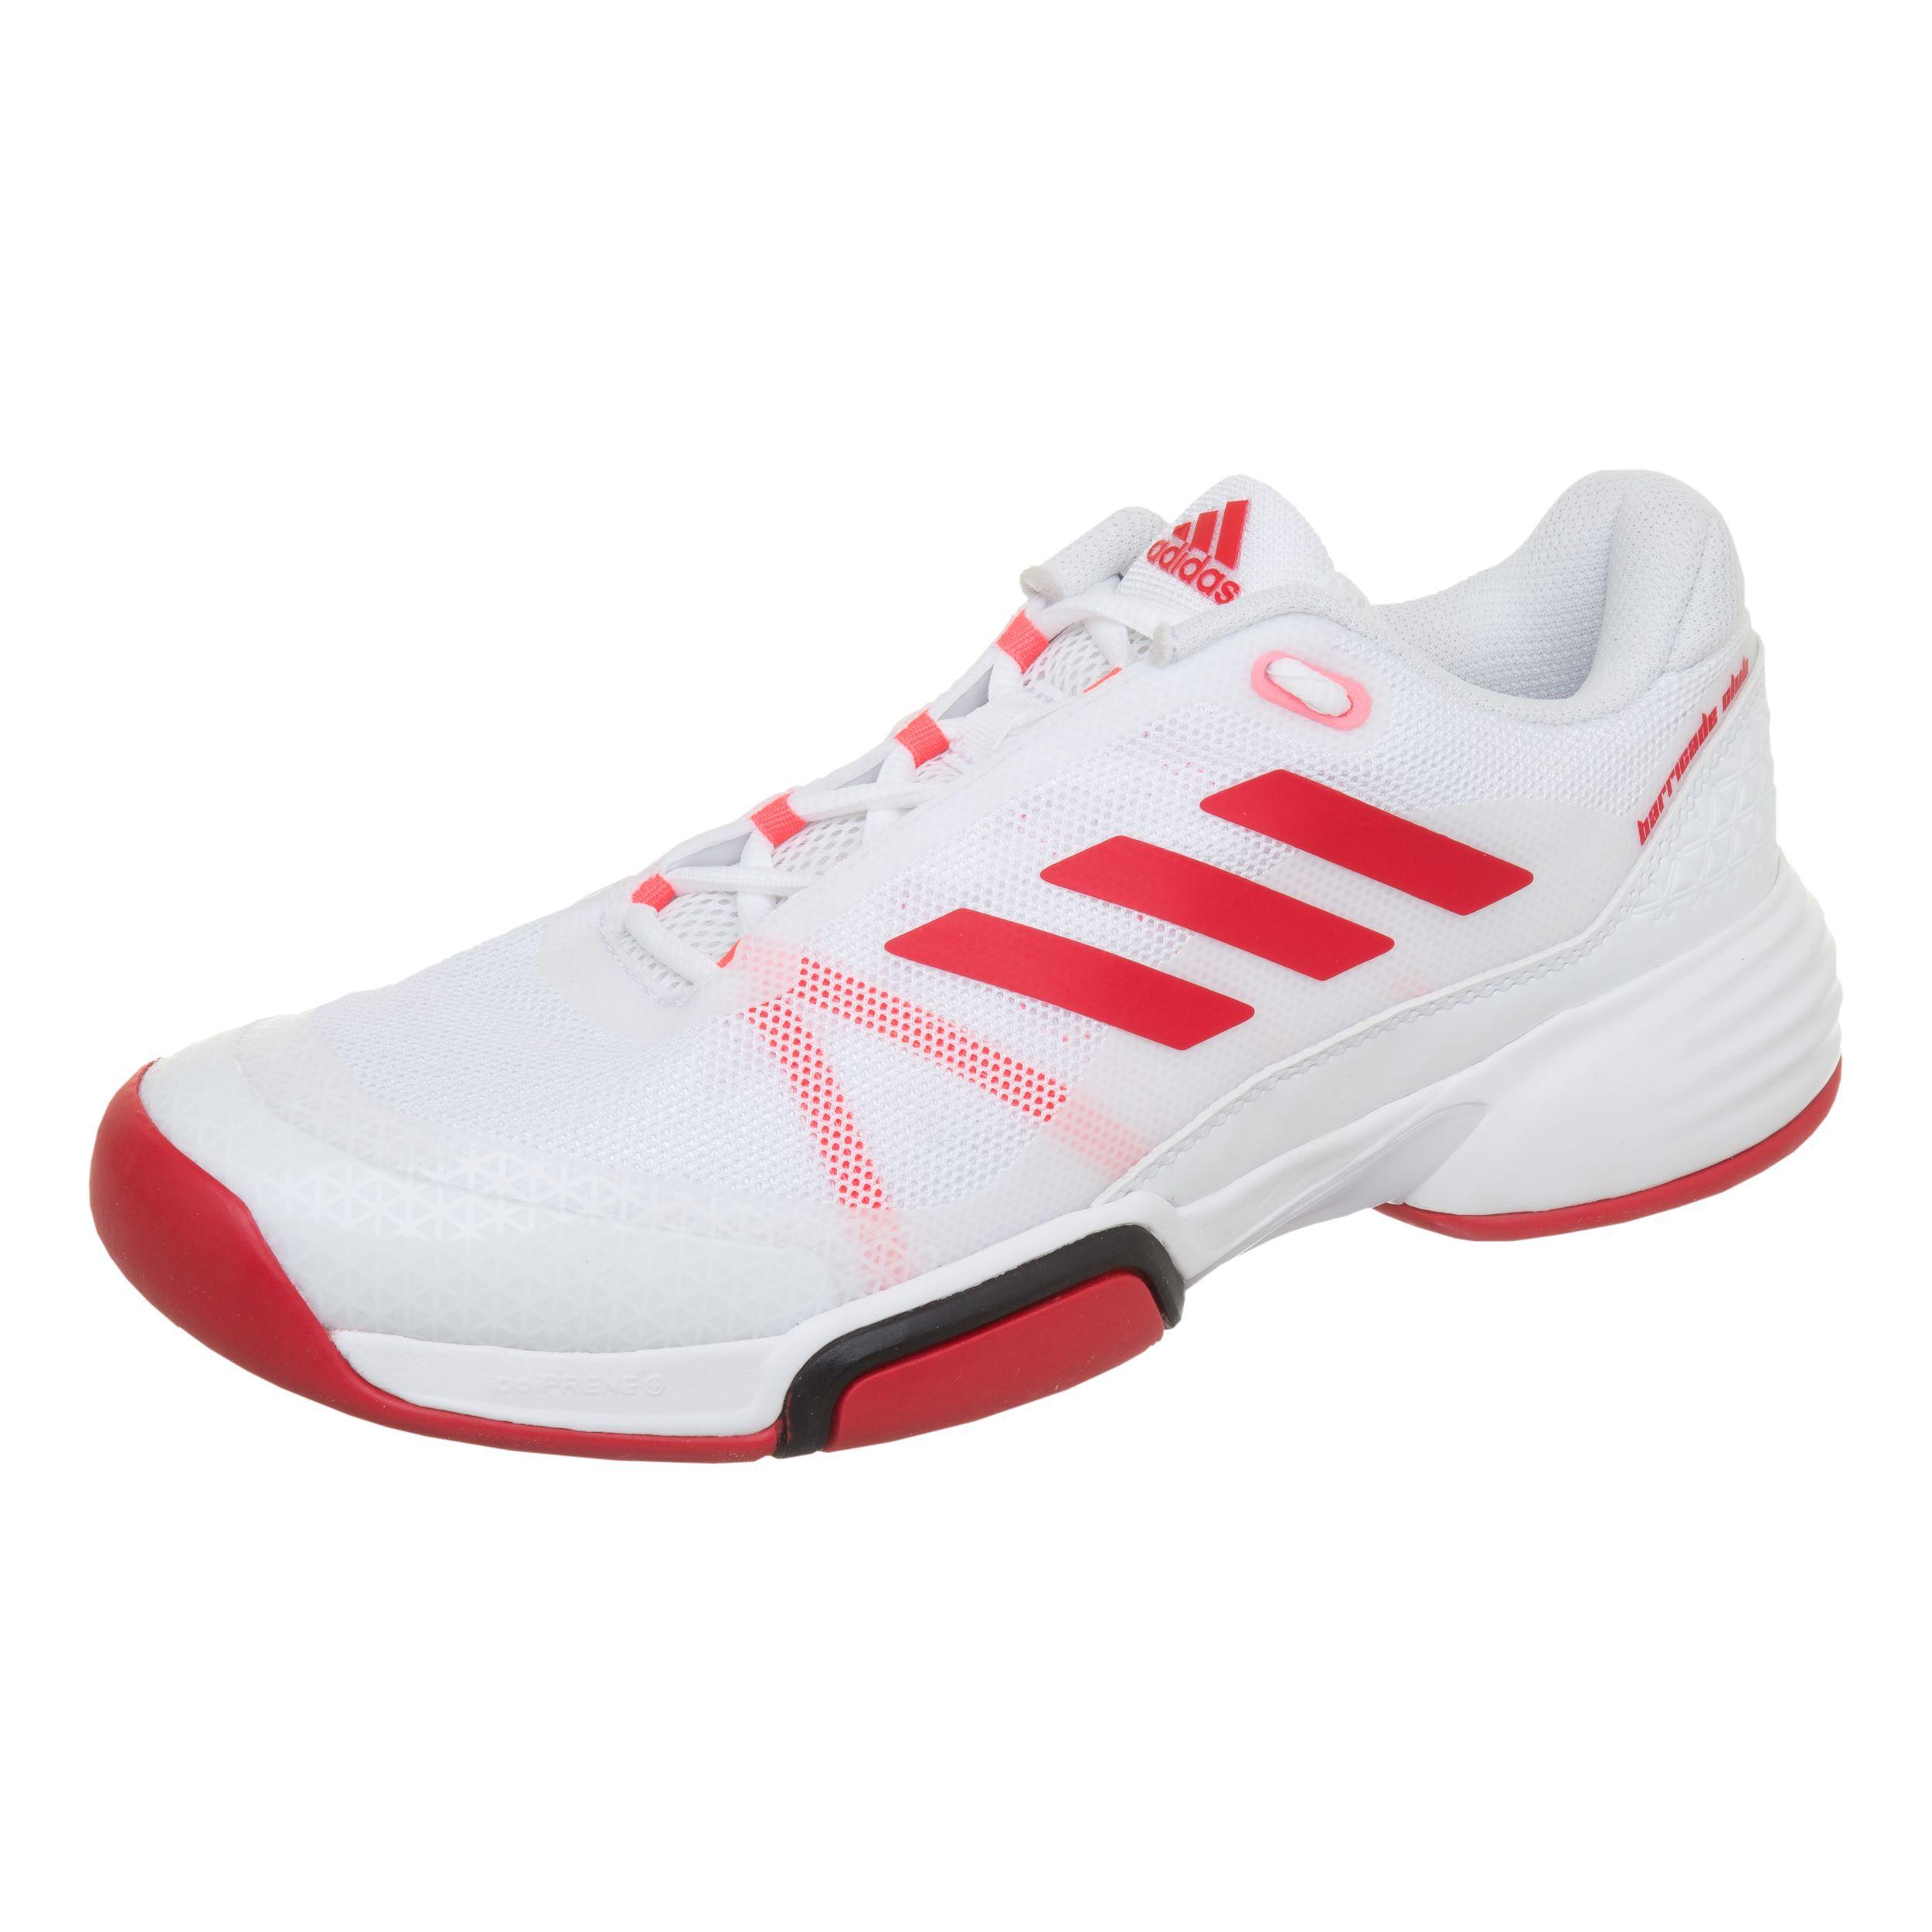 re2163 adidas herre barricade club rød tennissko online